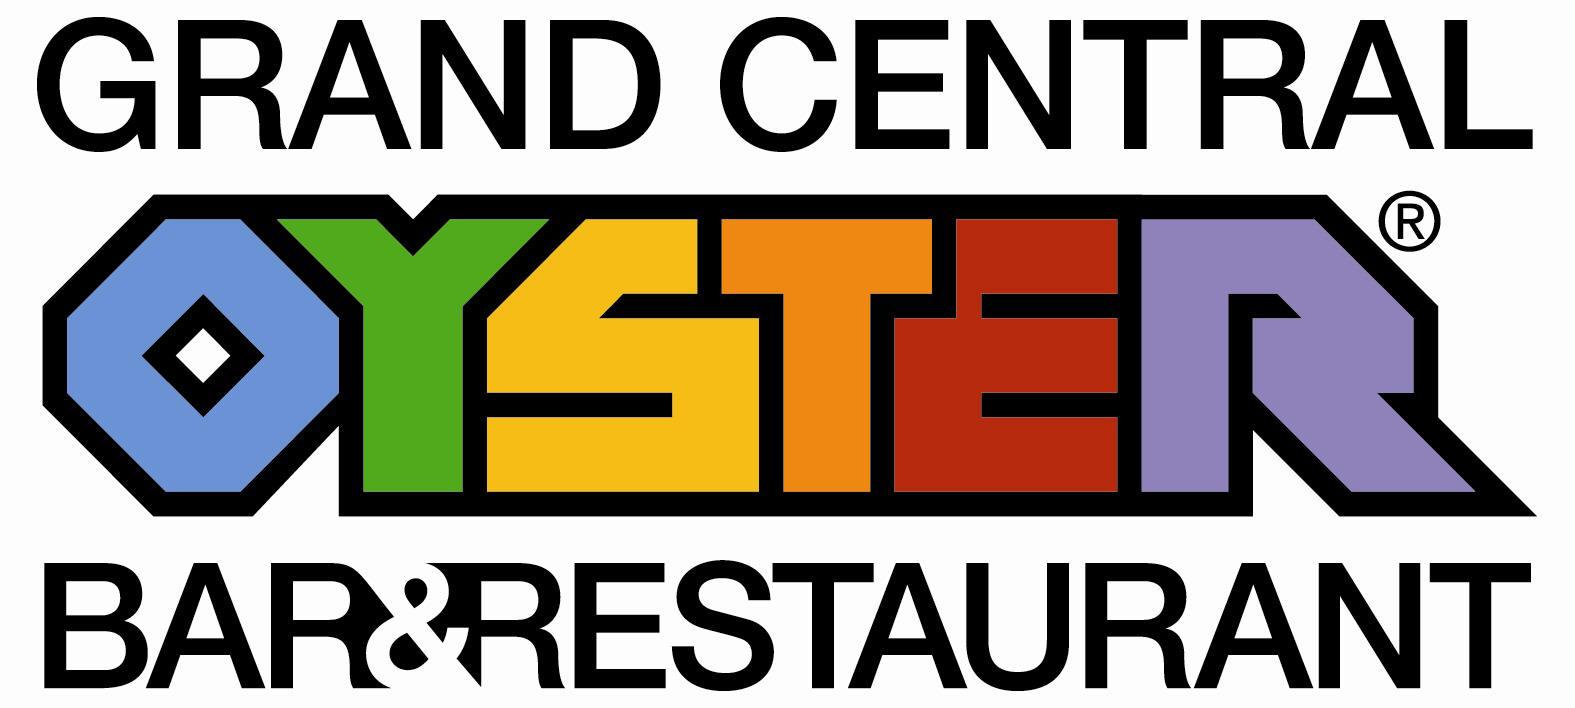 Grand-Central-Oyster-Bar-logo.jpg